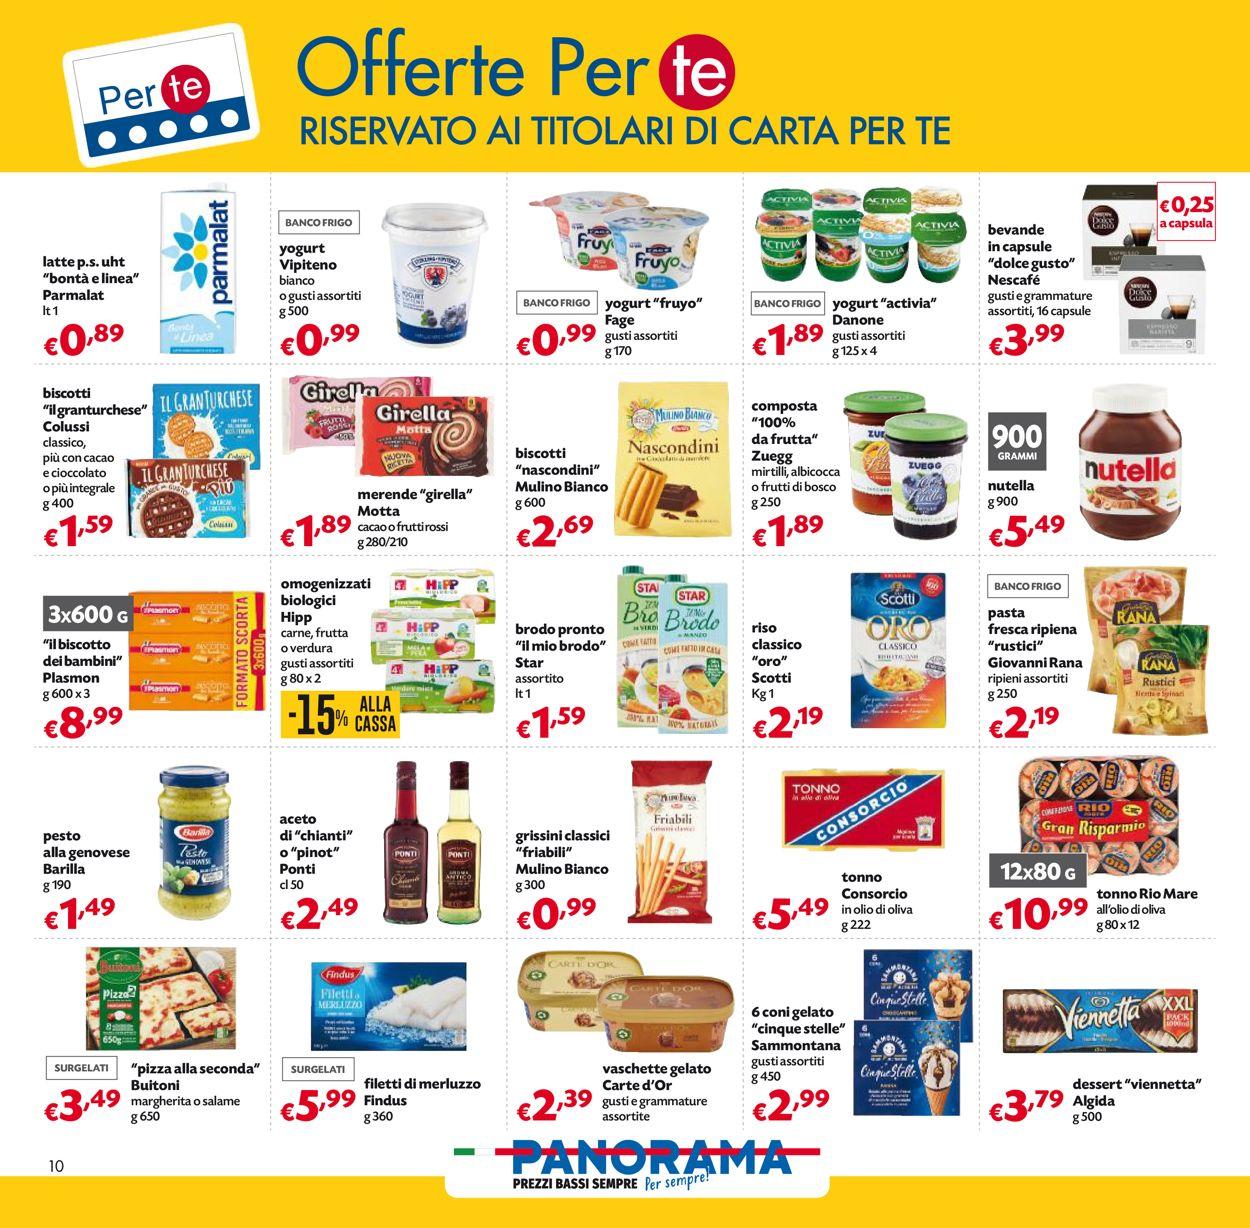 Volantino Pam Panorama - Offerte 22/04-05/05/2021 (Pagina 10)